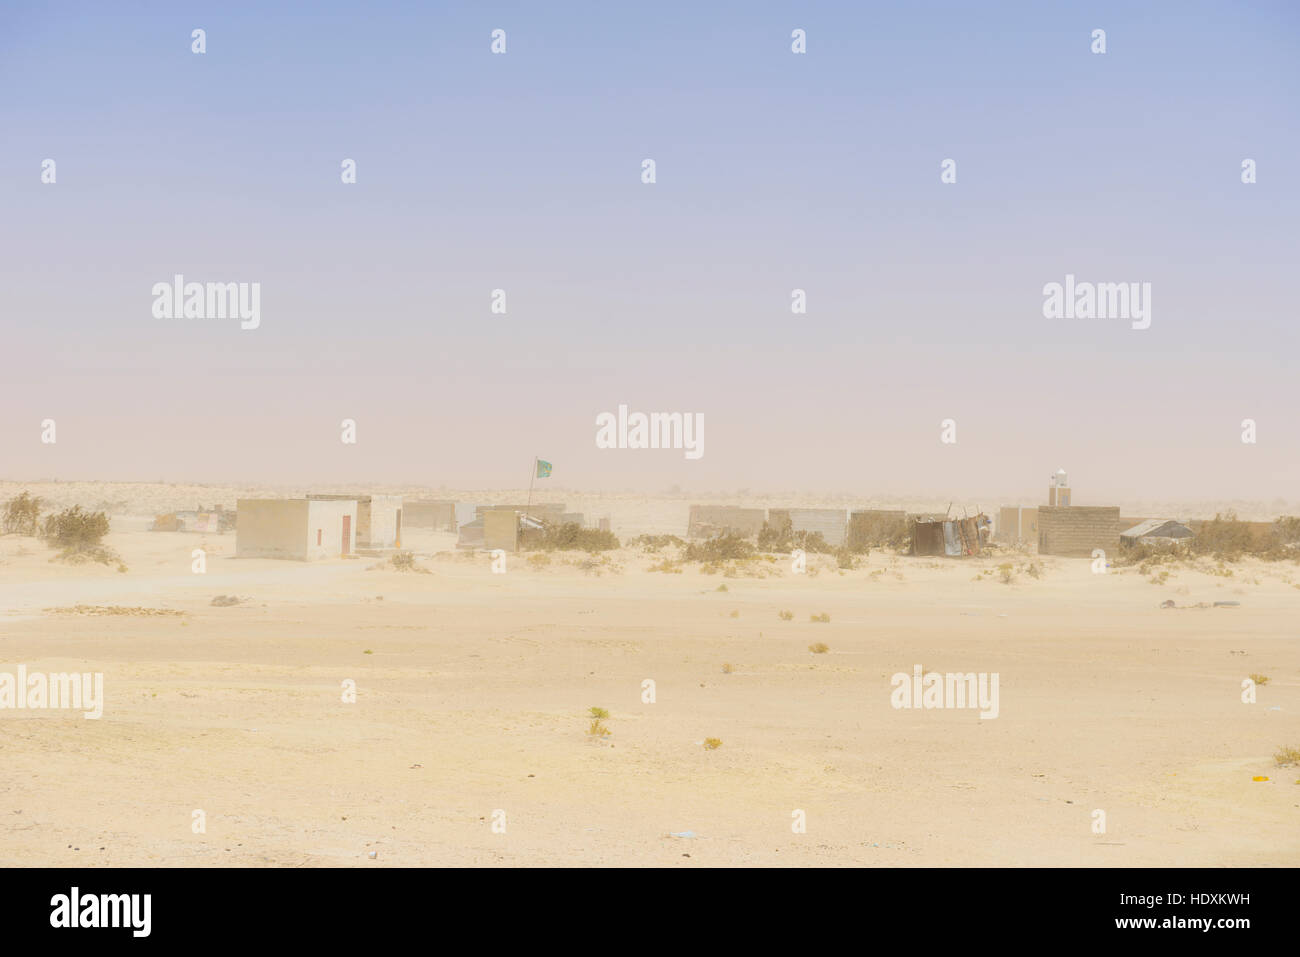 Villages of the Sahara desert, Mauritania - Stock Image